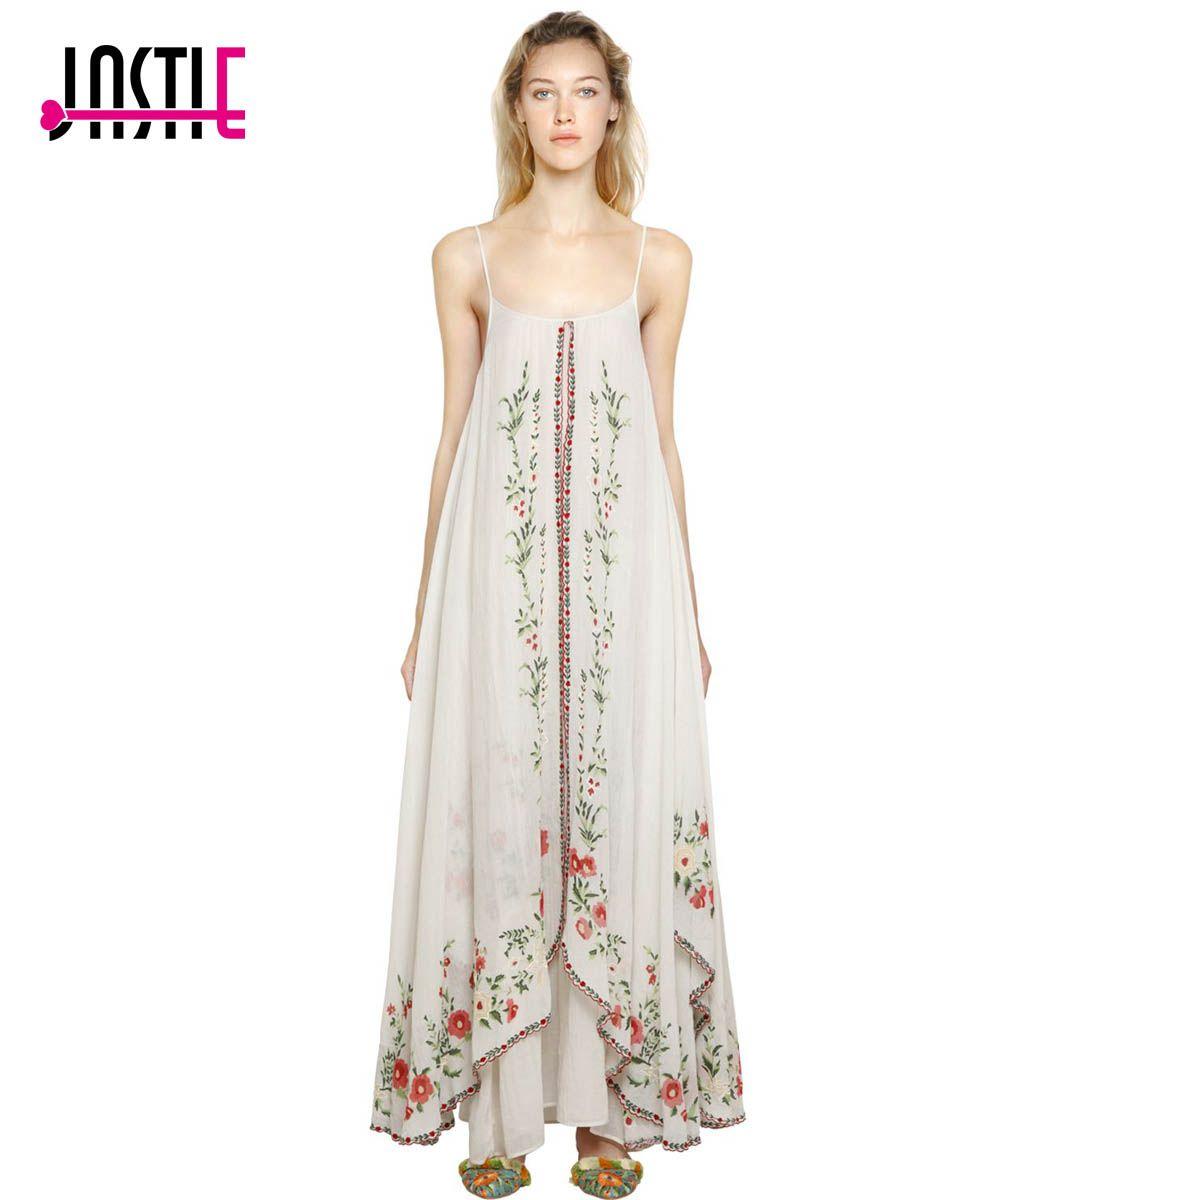 36bd9f988c62 Jaatie Adjustable Straps Summer Dresses Floral Embroidered Maxi Dress  Ruffle Hem Boho Dress Female Vestidos 2017 Women clothing Price: 50.90 &  FREE Shipping ...